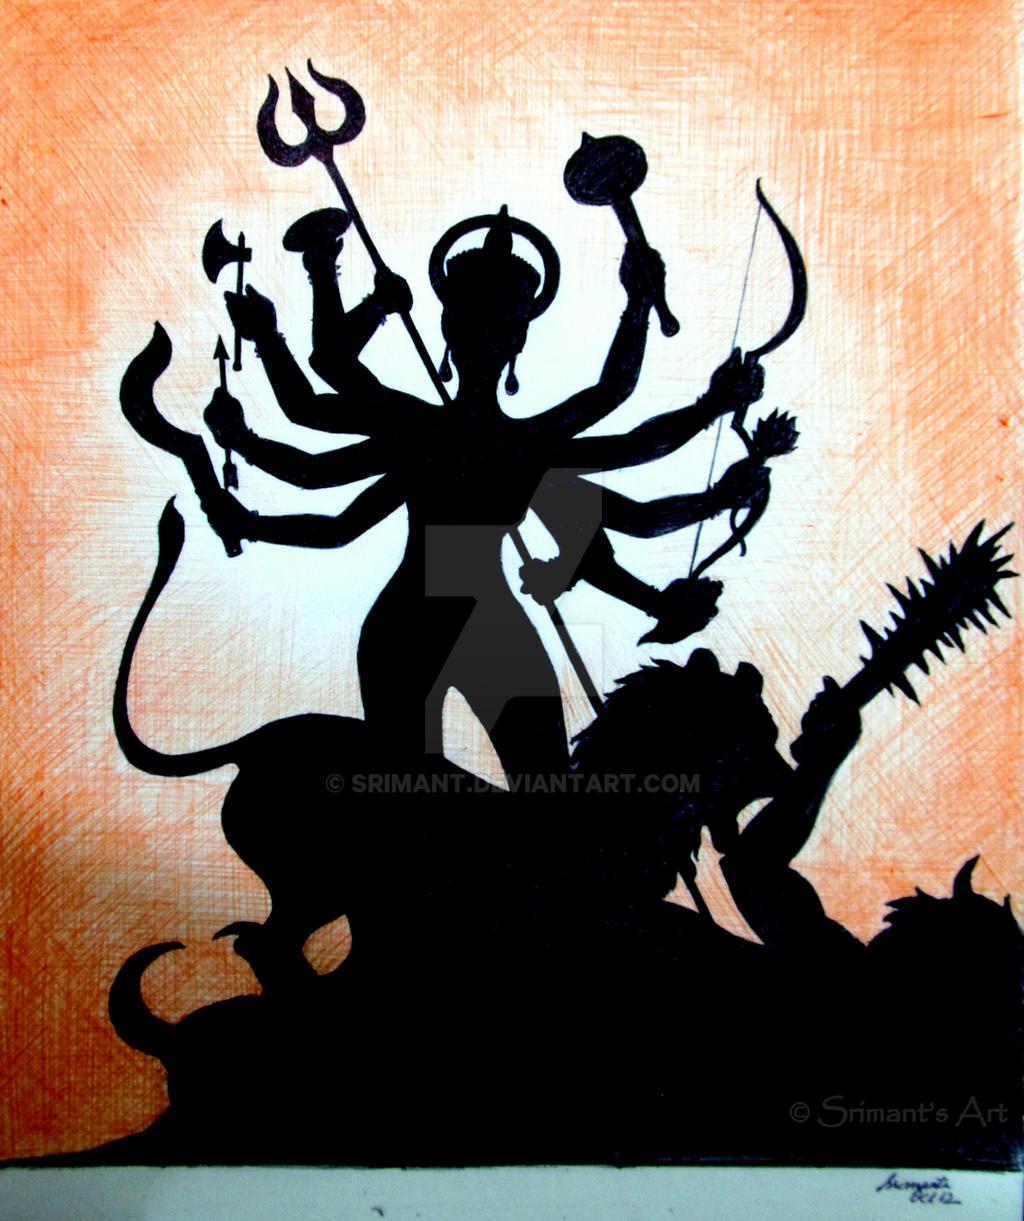 Maa Durga By Srimant On DeviantArt